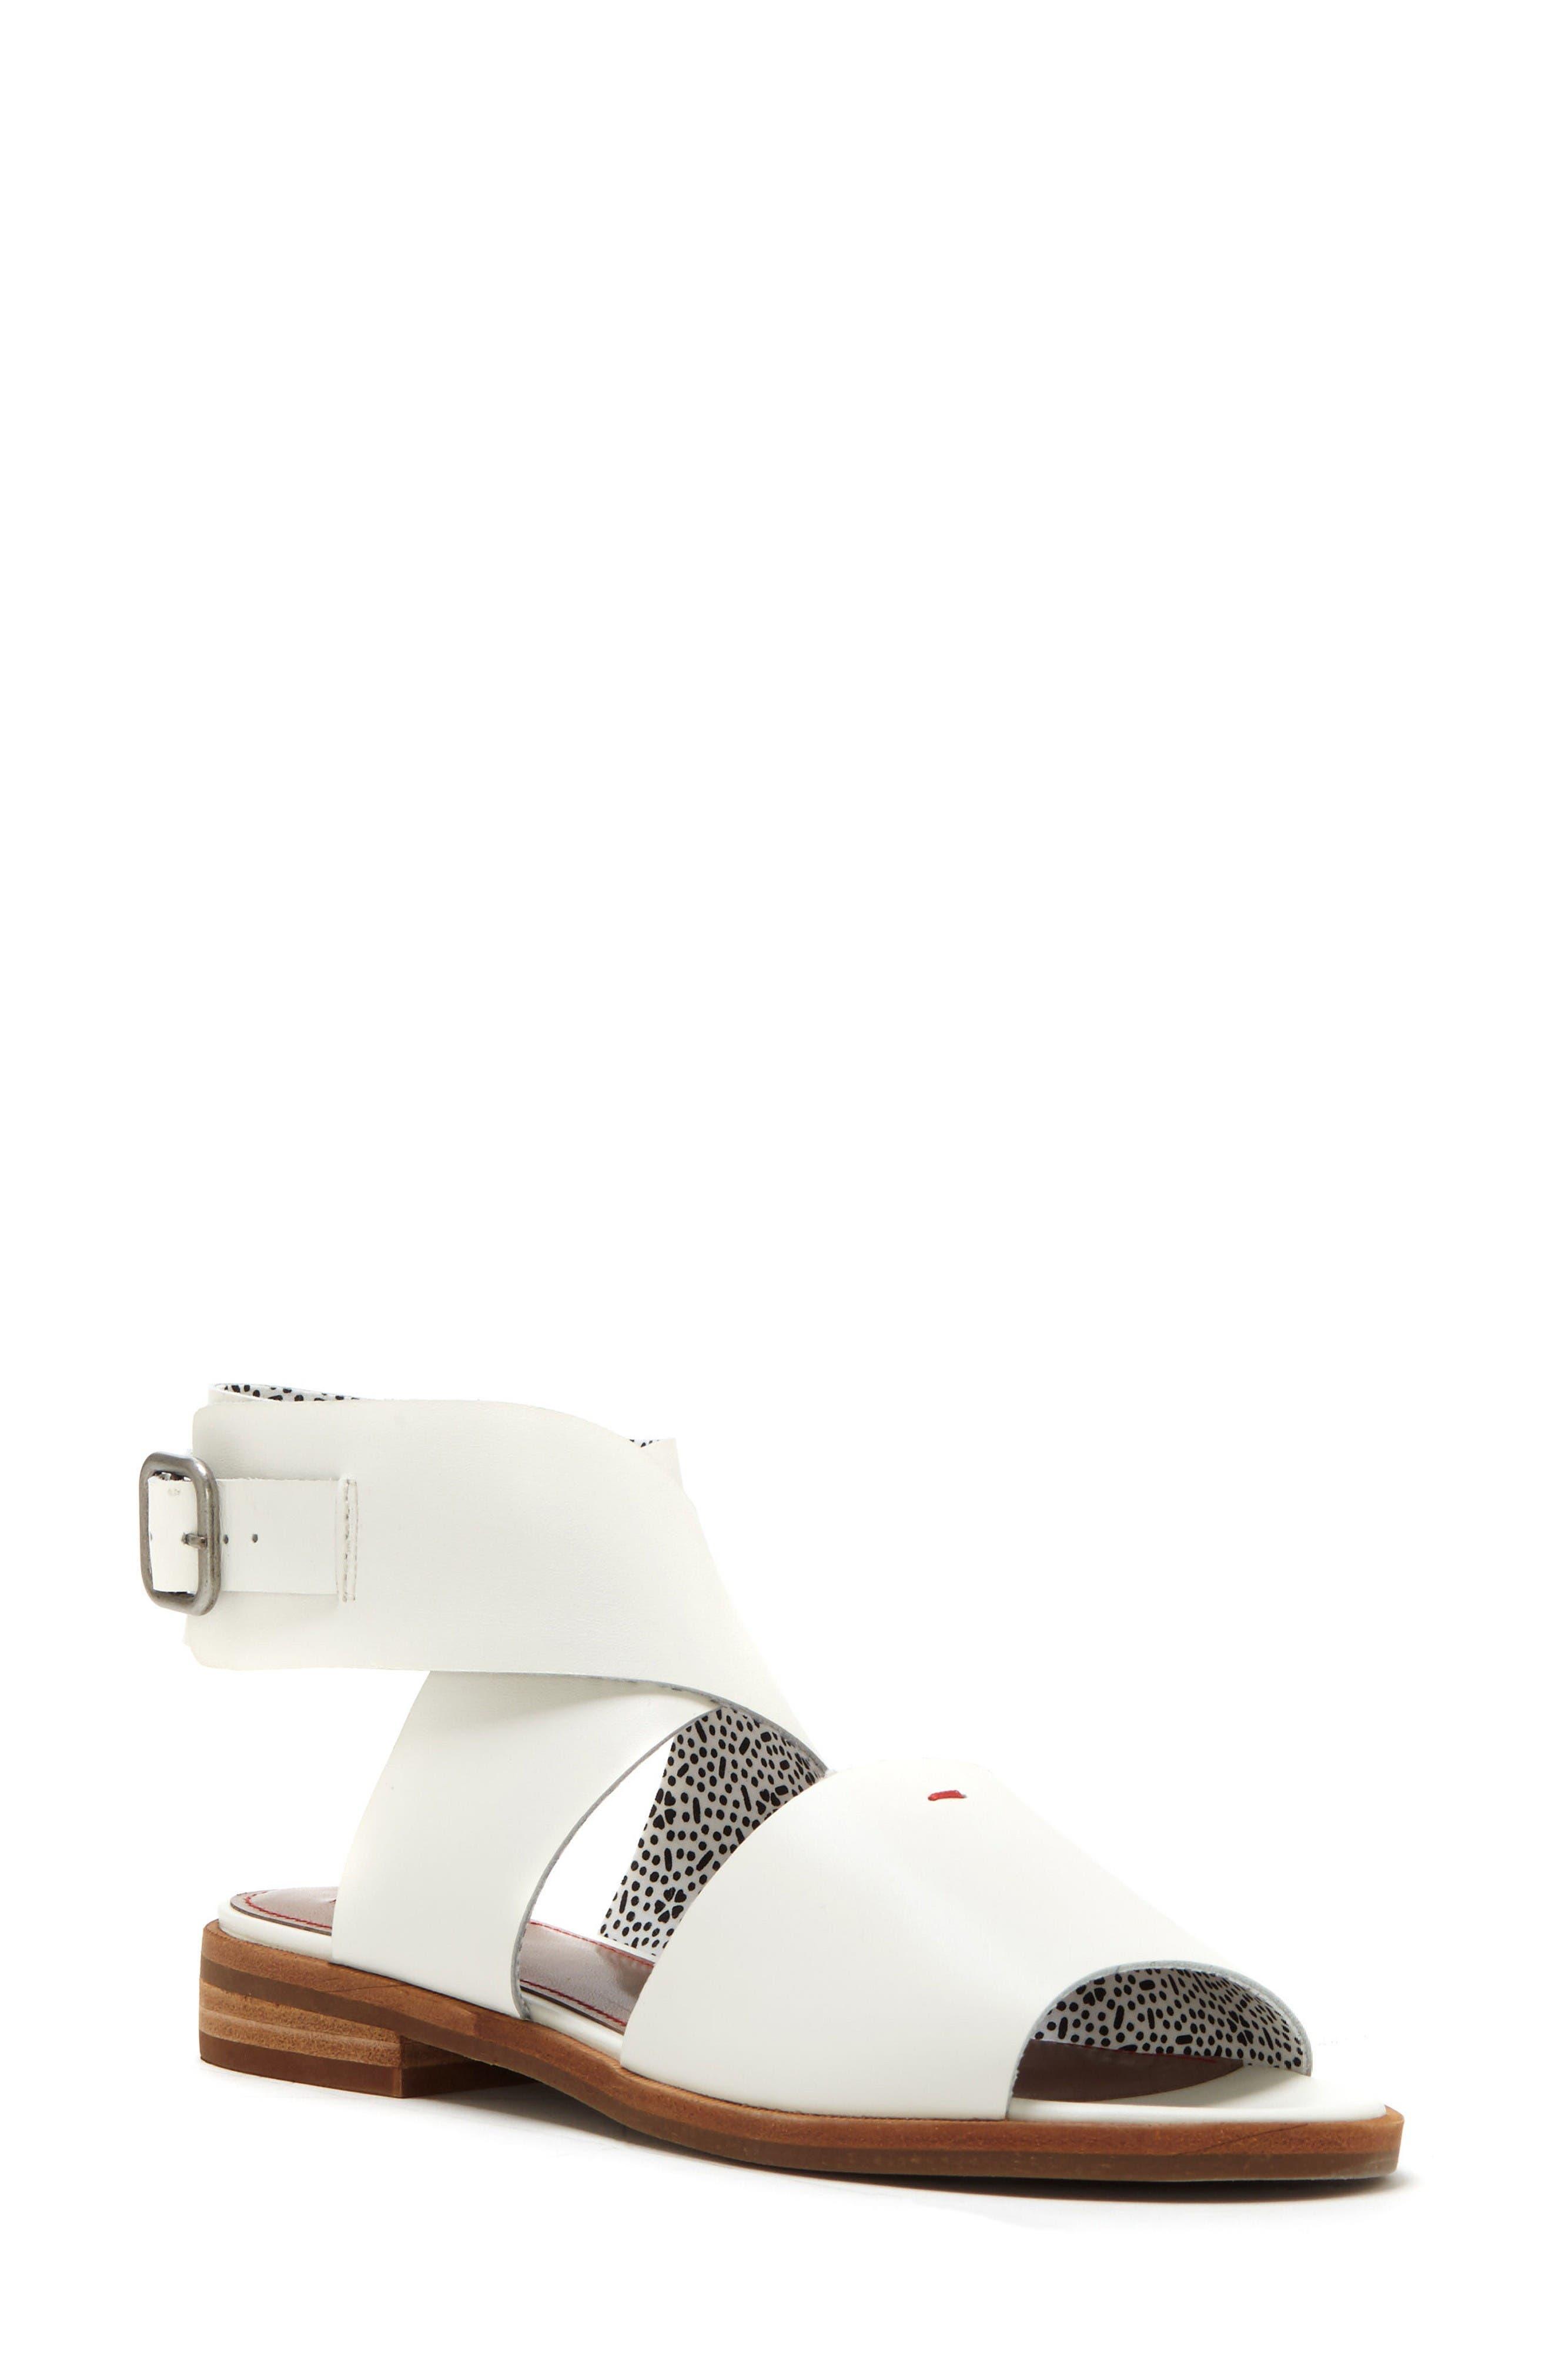 Sanja Sandal,                         Main,                         color, Milk Leather